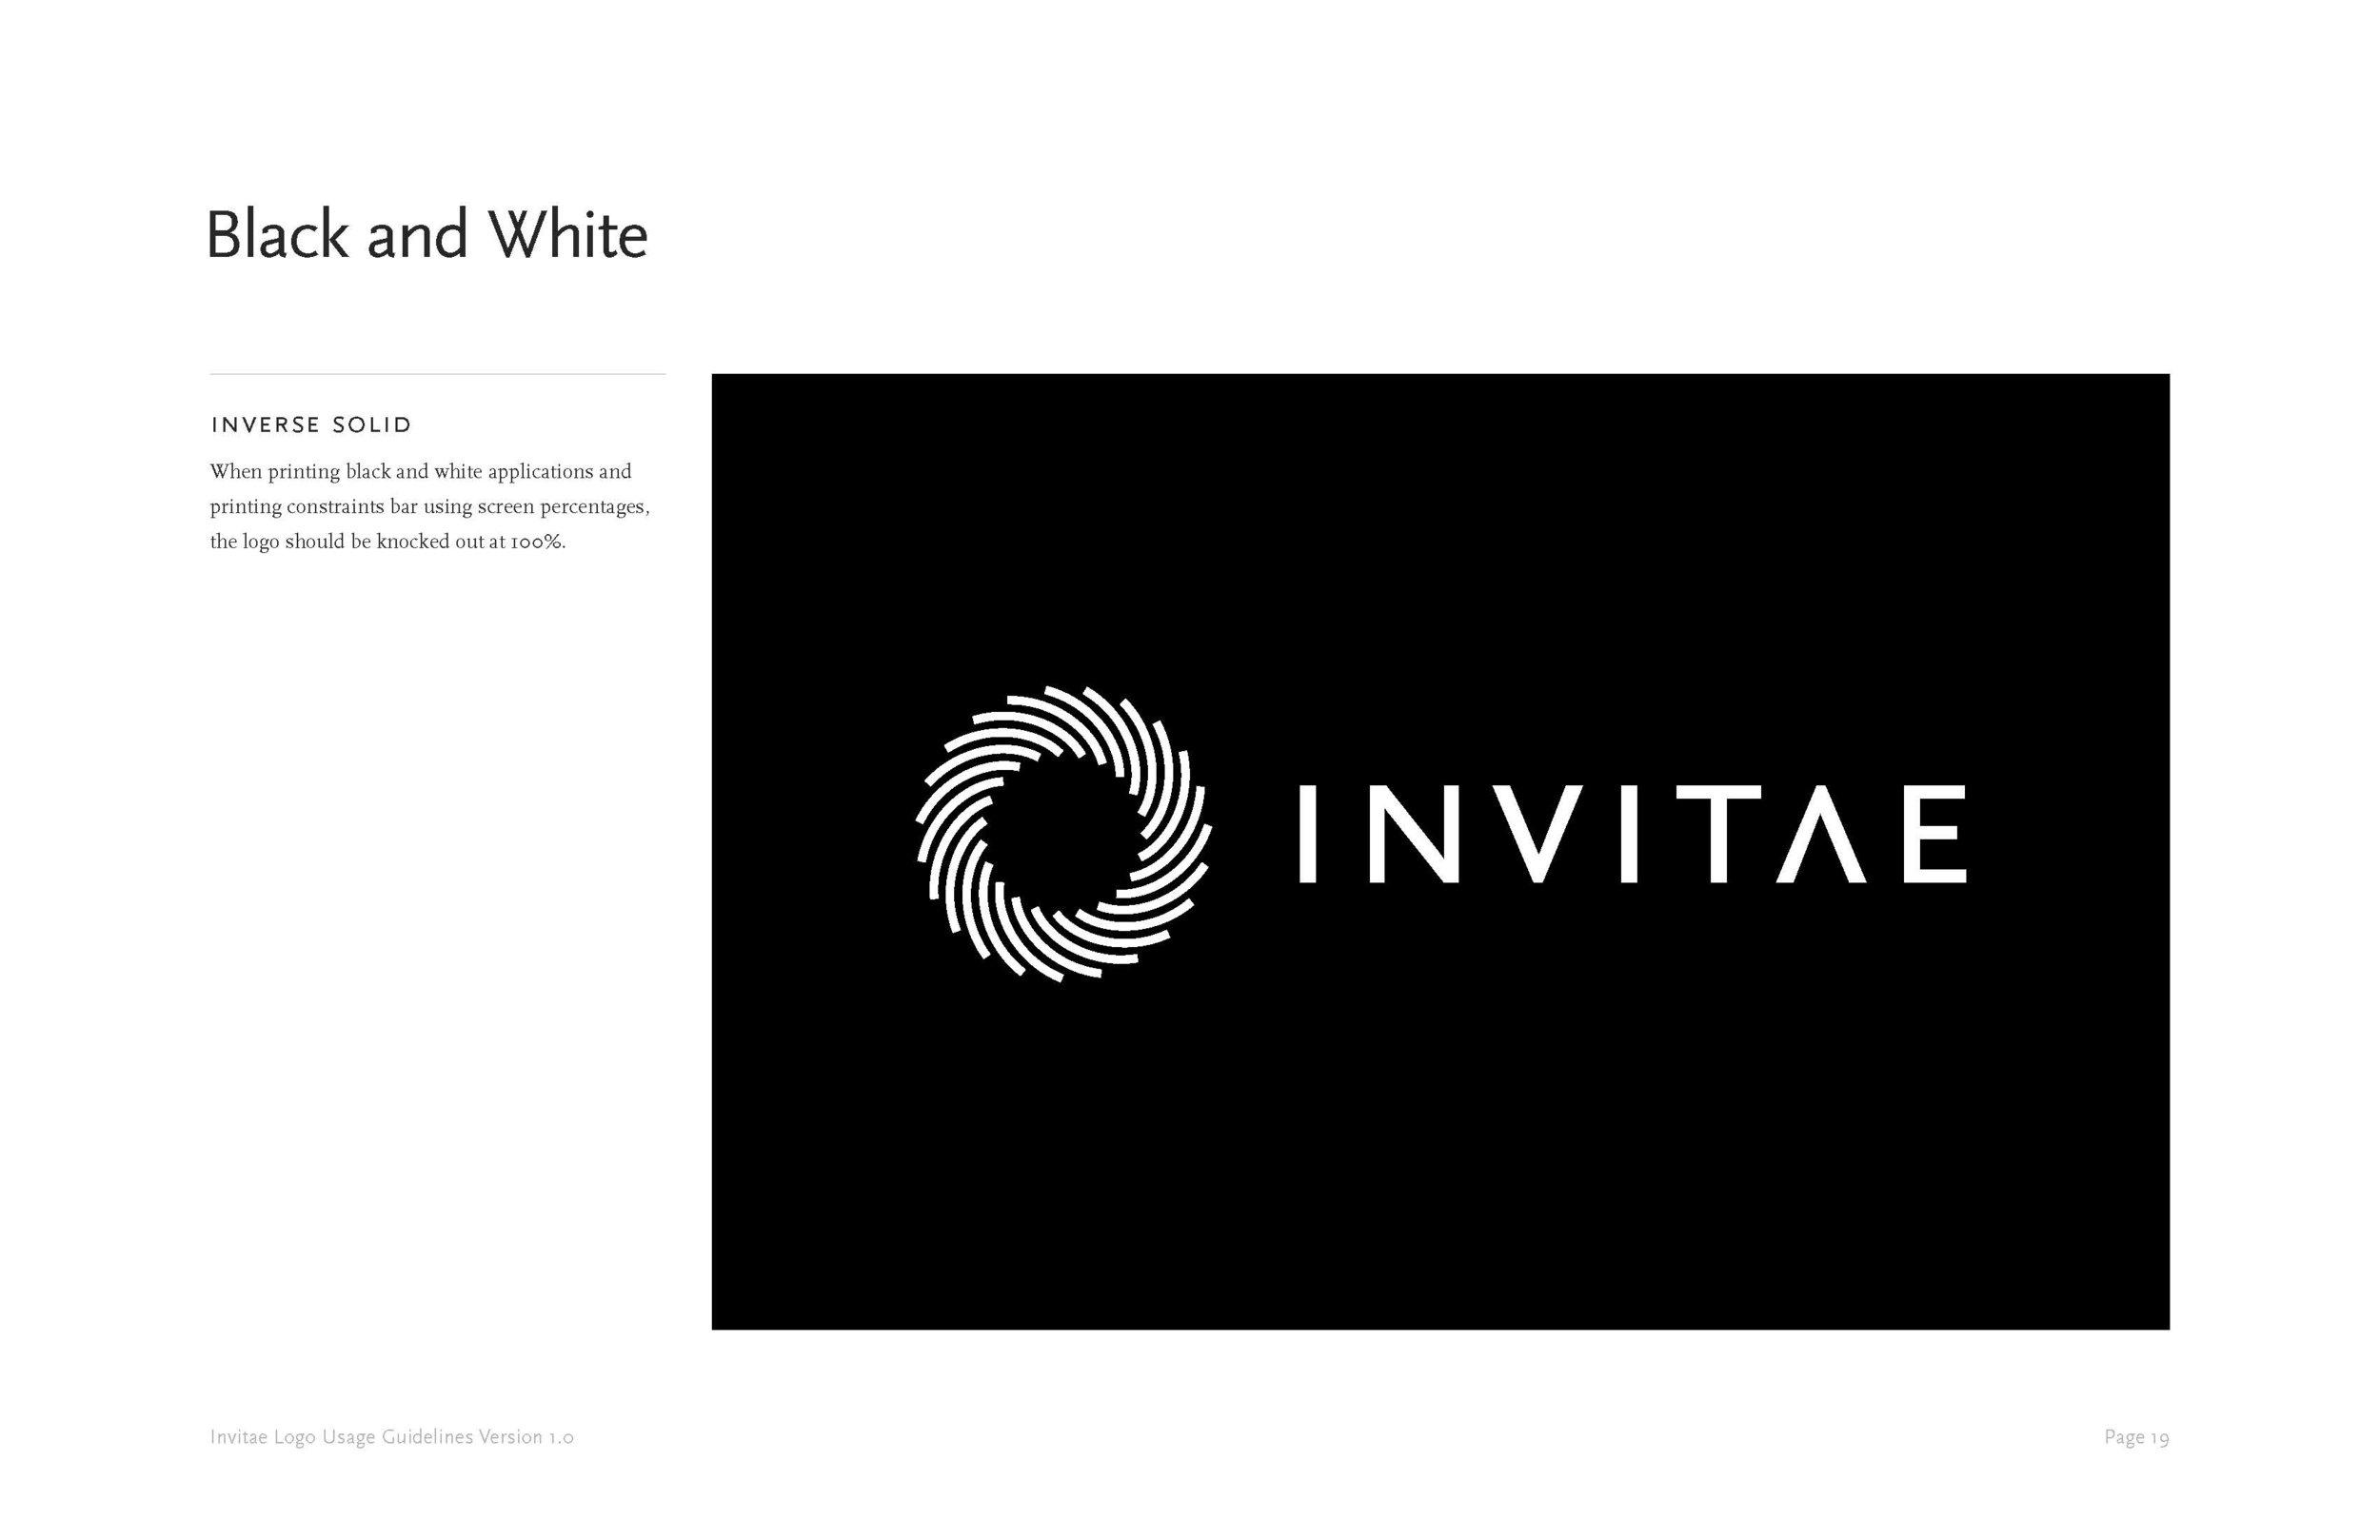 Invitae_logo_guidelines_Page_21.jpg